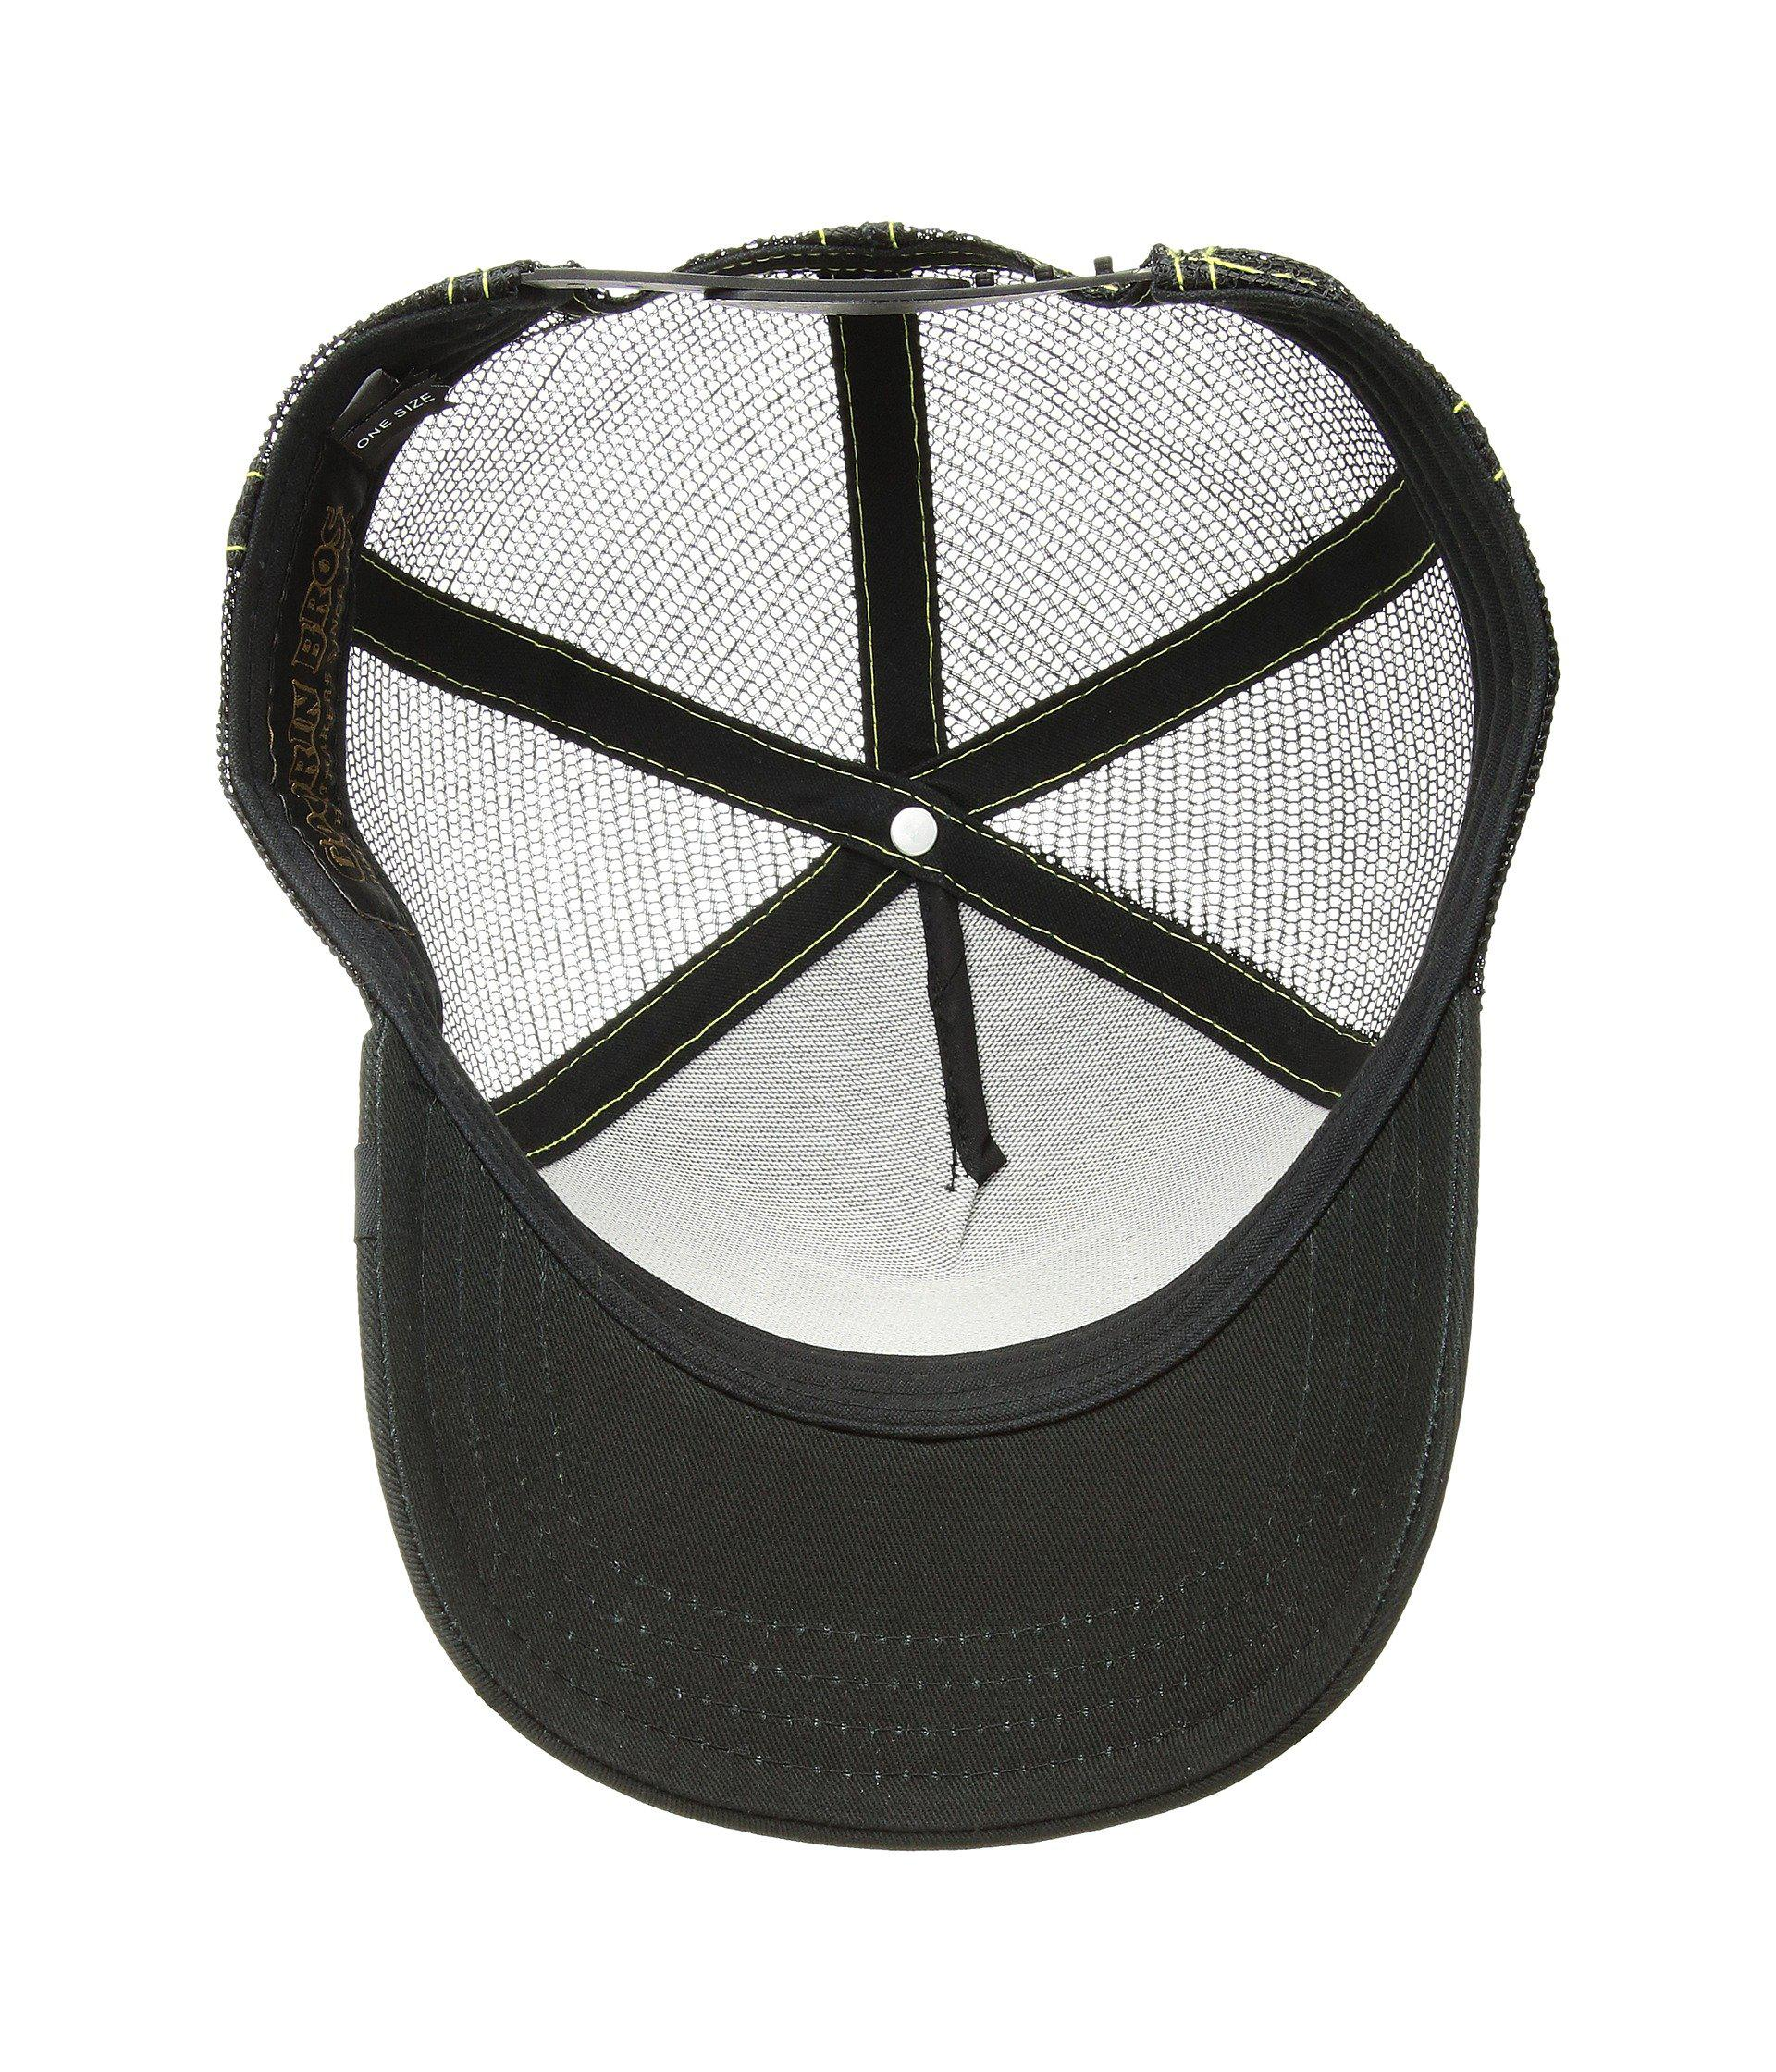 14719323bbc1b Animal Farm Trucker Snapback Hat Cap Black Queen Bee White  Herren-Accessoires New Goorin Bros